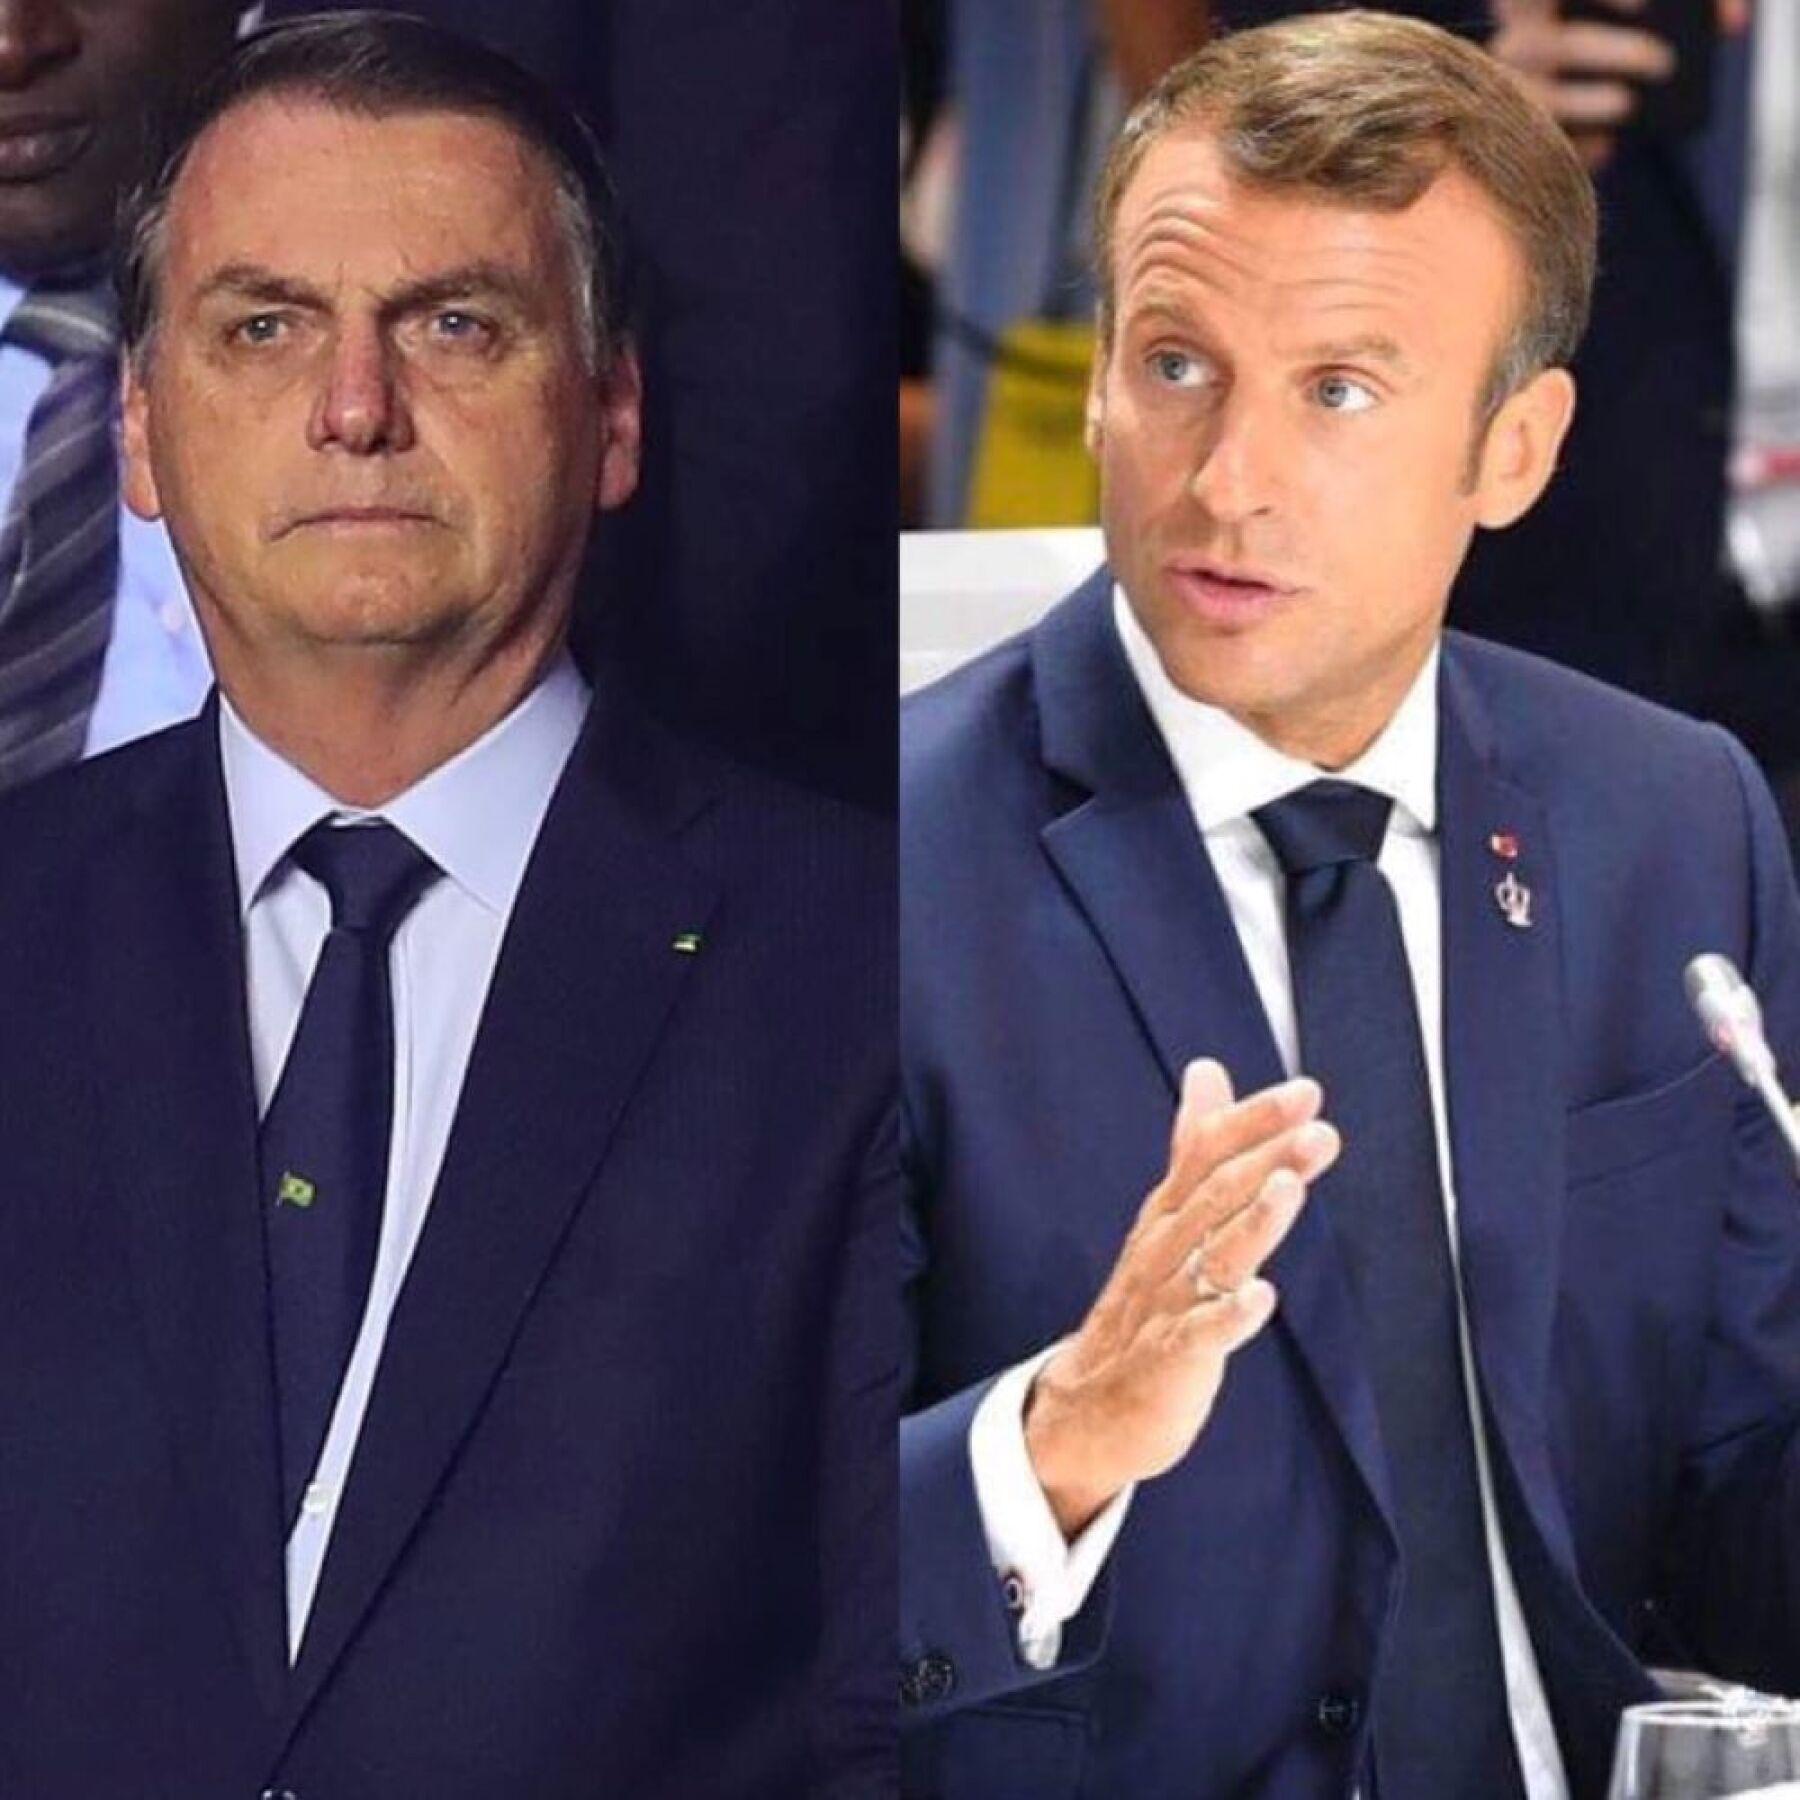 Emmanuel Macron Enfrenta Al Presidente De Brasil Por Burlarse De Su Esposa